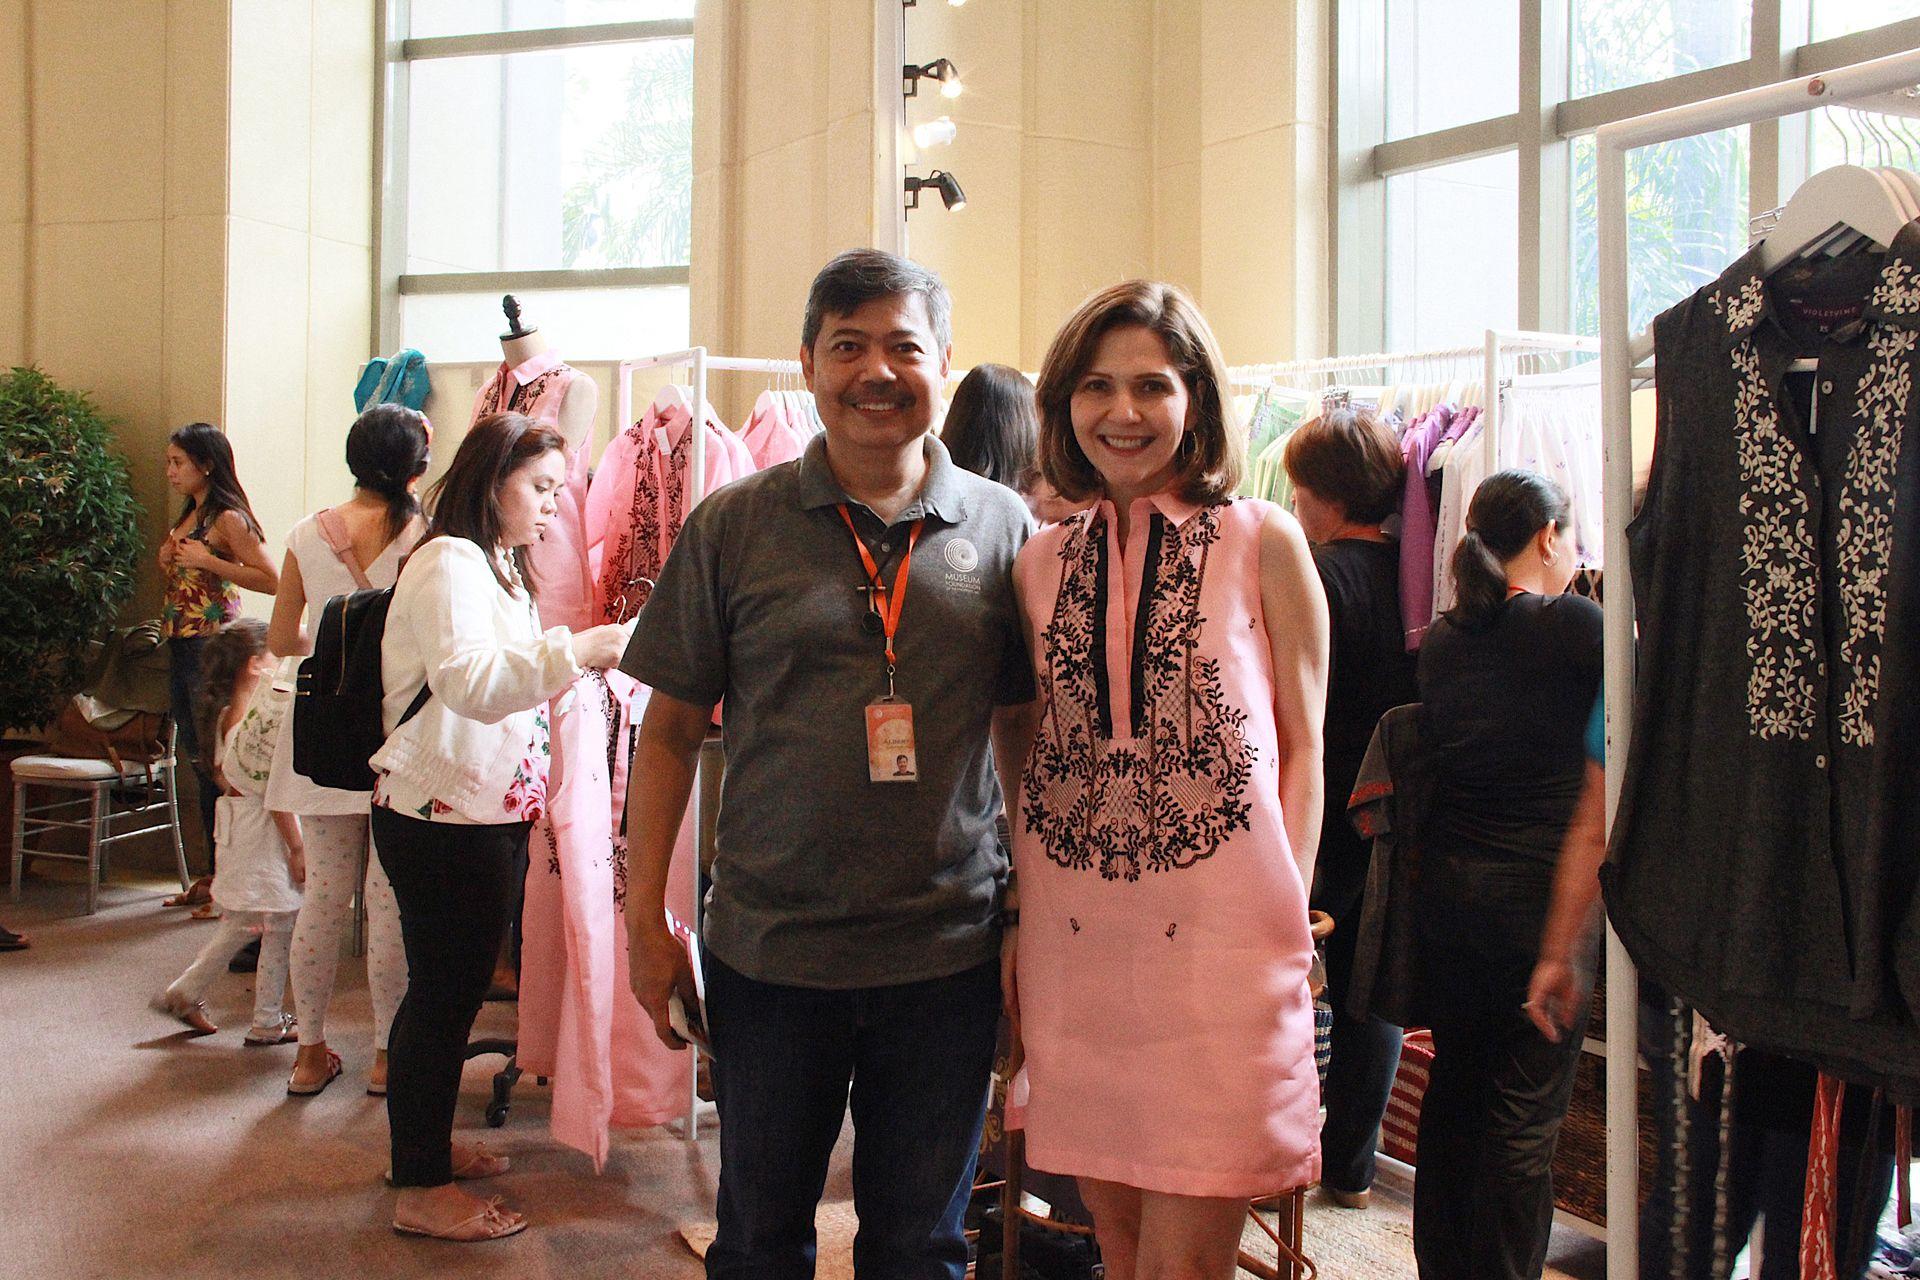 Albert Avellana with designer Anne Marie Robicheau Saguil